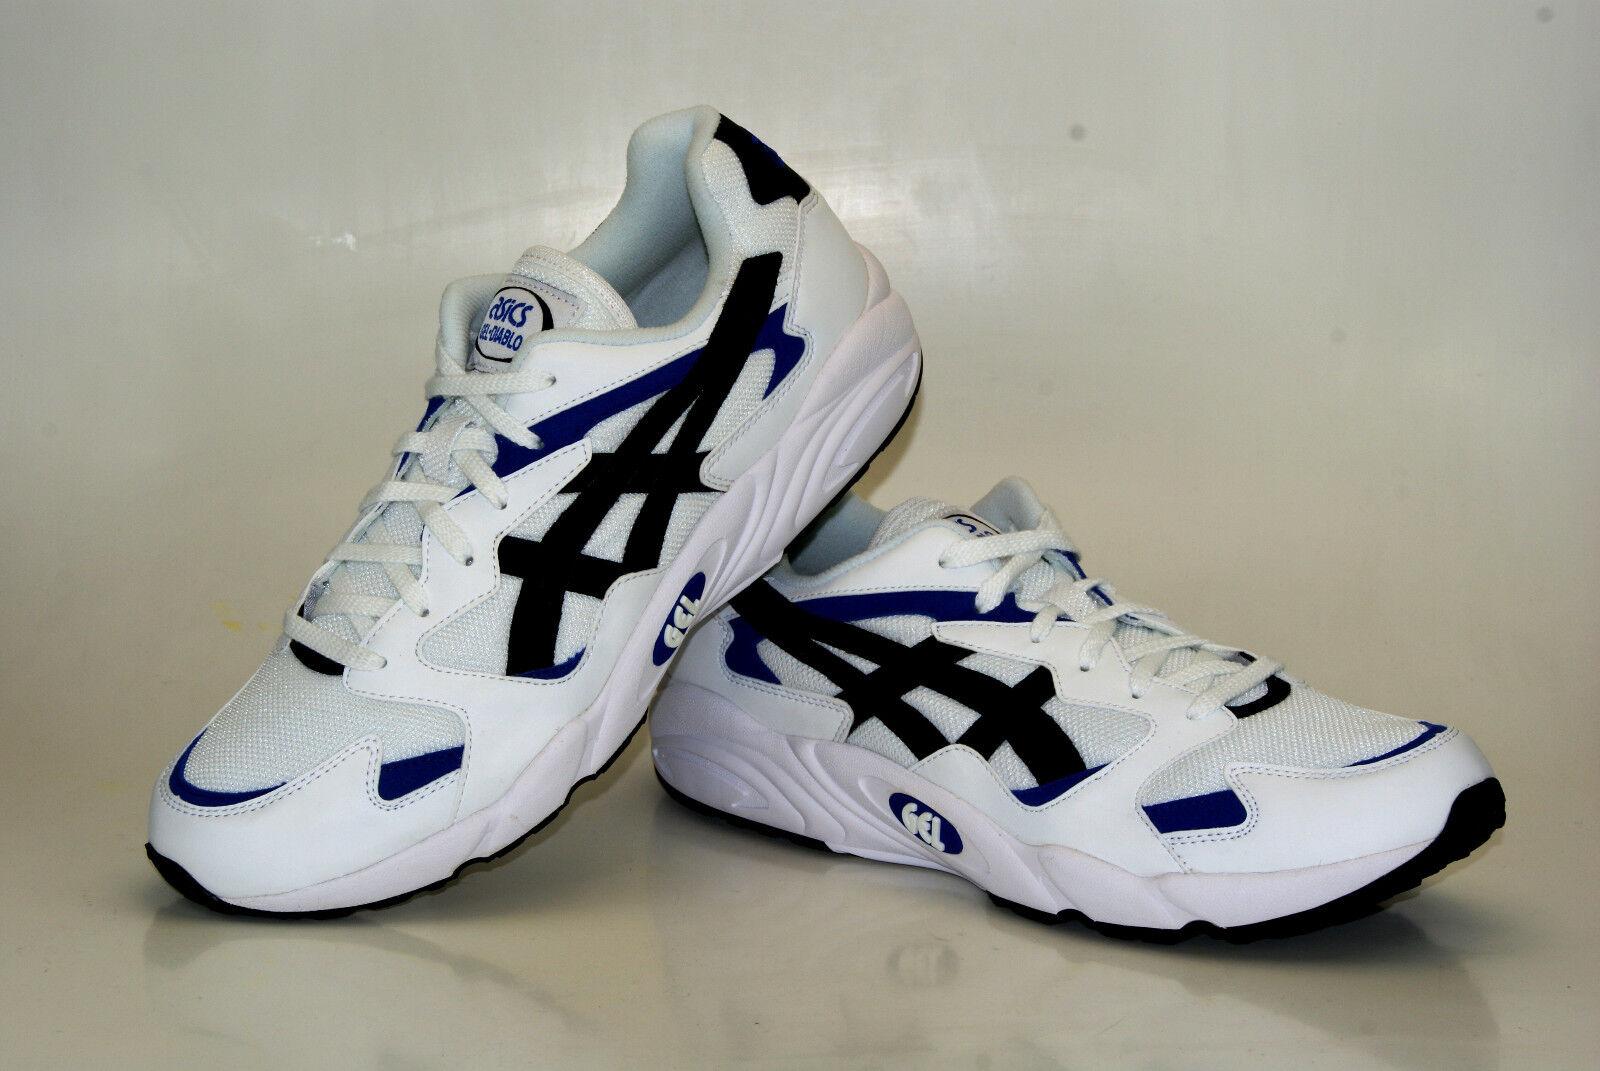 Asics Gel Diablo Trainers Sneakers Trainers Men's shoes shoes shoes Hy7h1-0190 4d1b0a